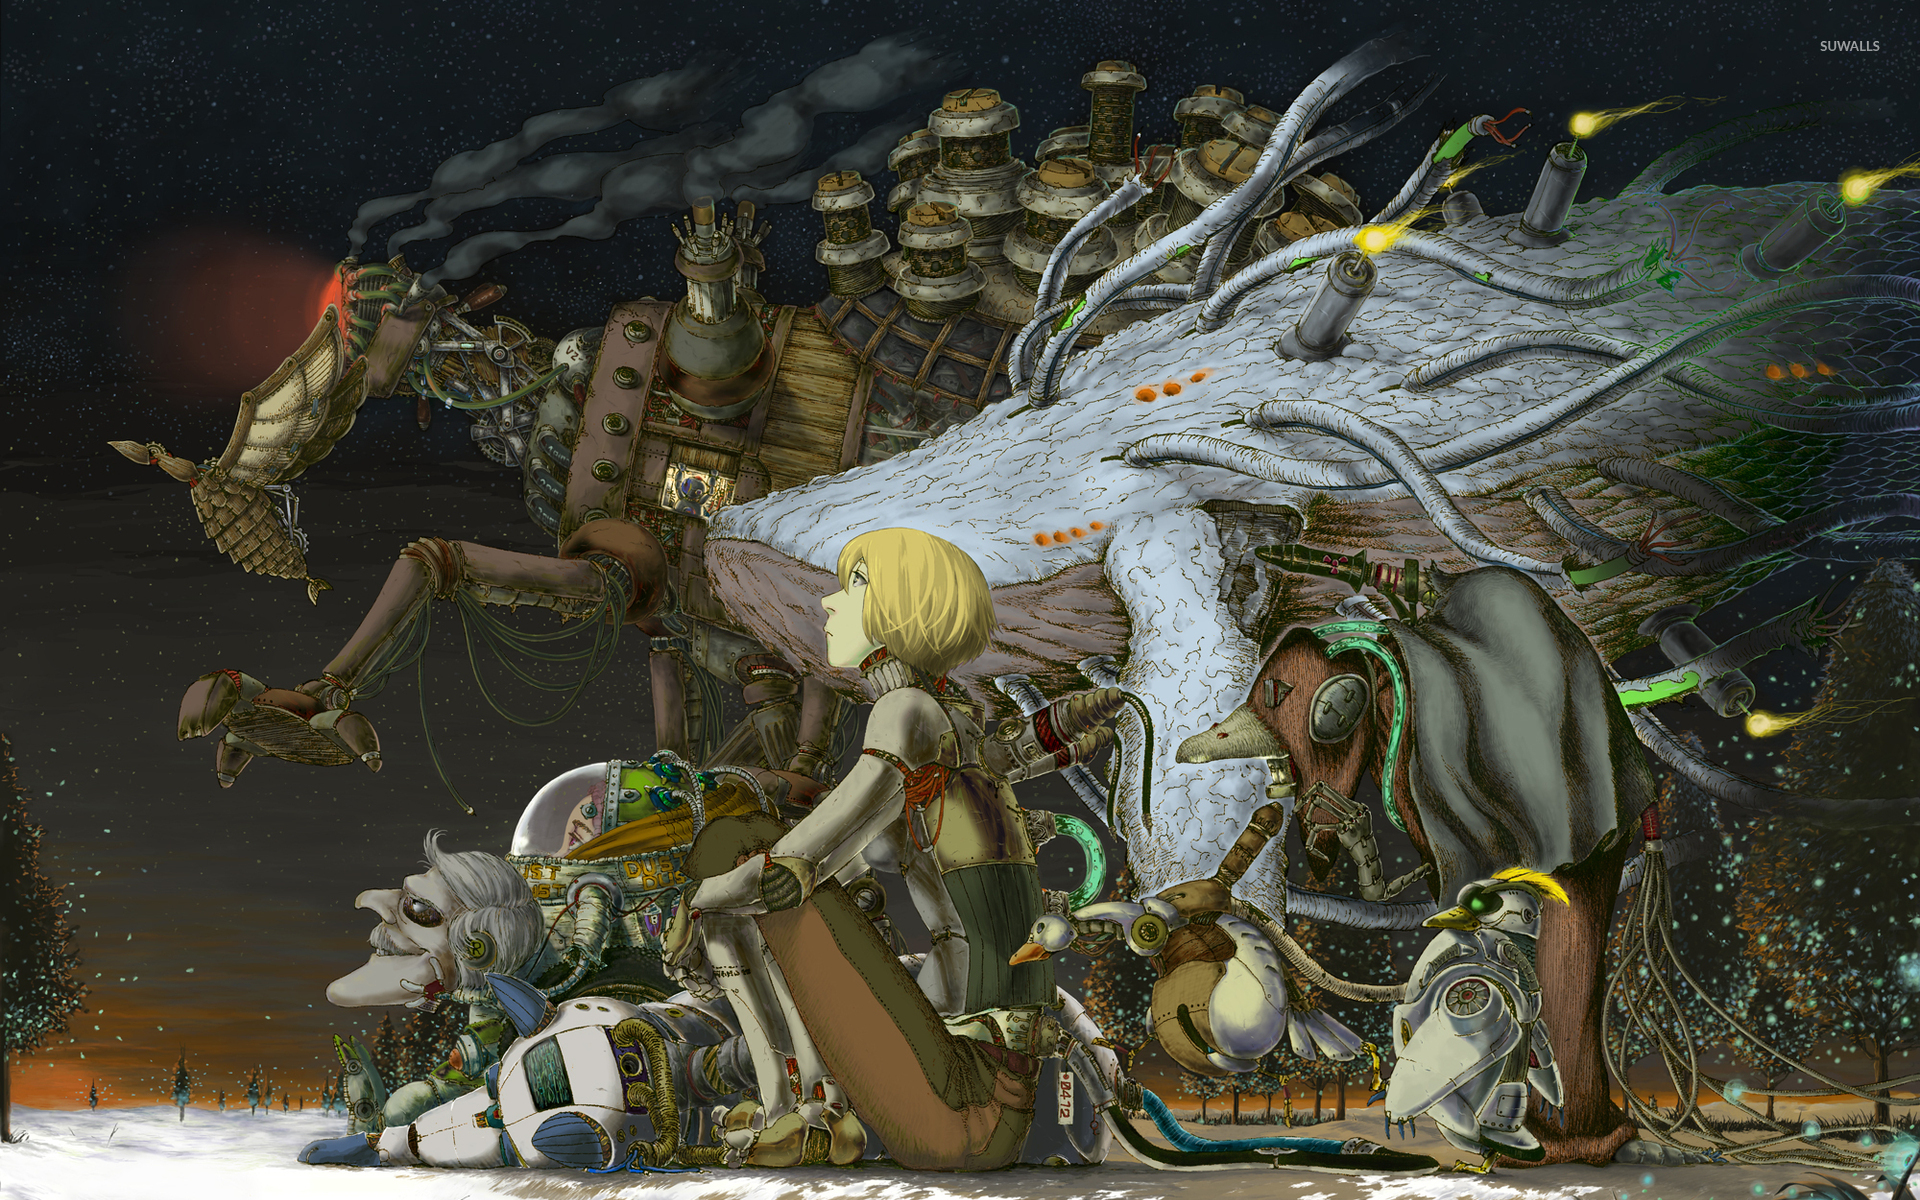 Interesting Creatures Wallpaper Fantasy Wallpapers 45786 HD Wallpapers Download Free Images Wallpaper [1000image.com]